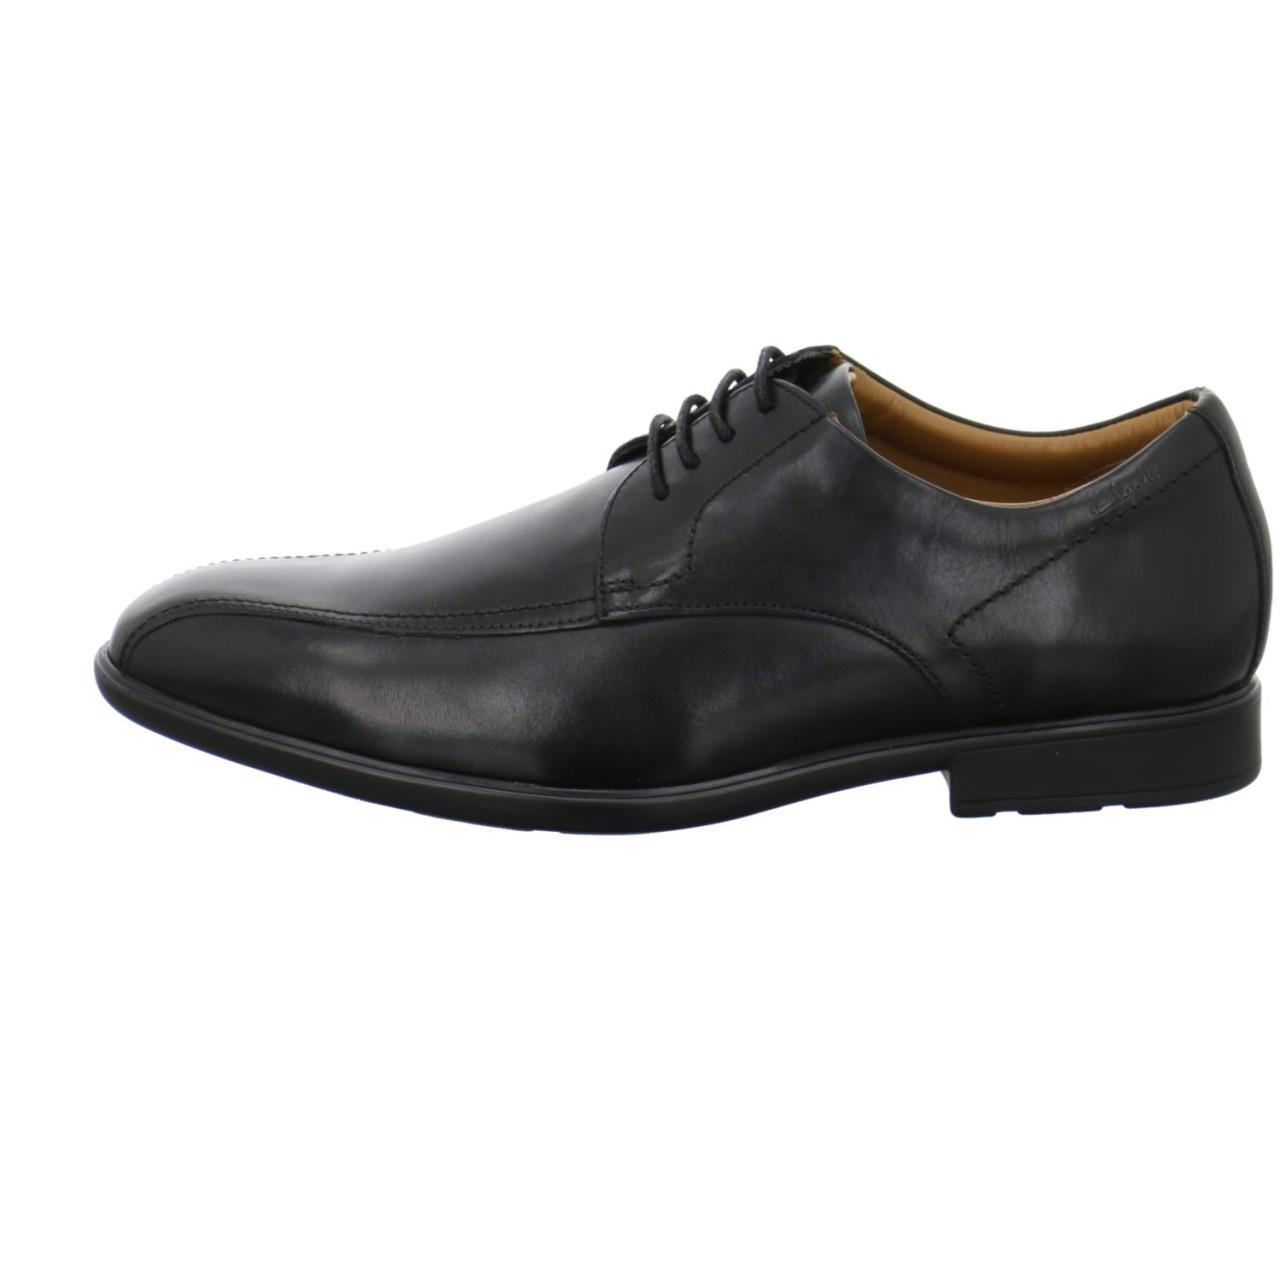 Clarks Business Schuhe schwarz